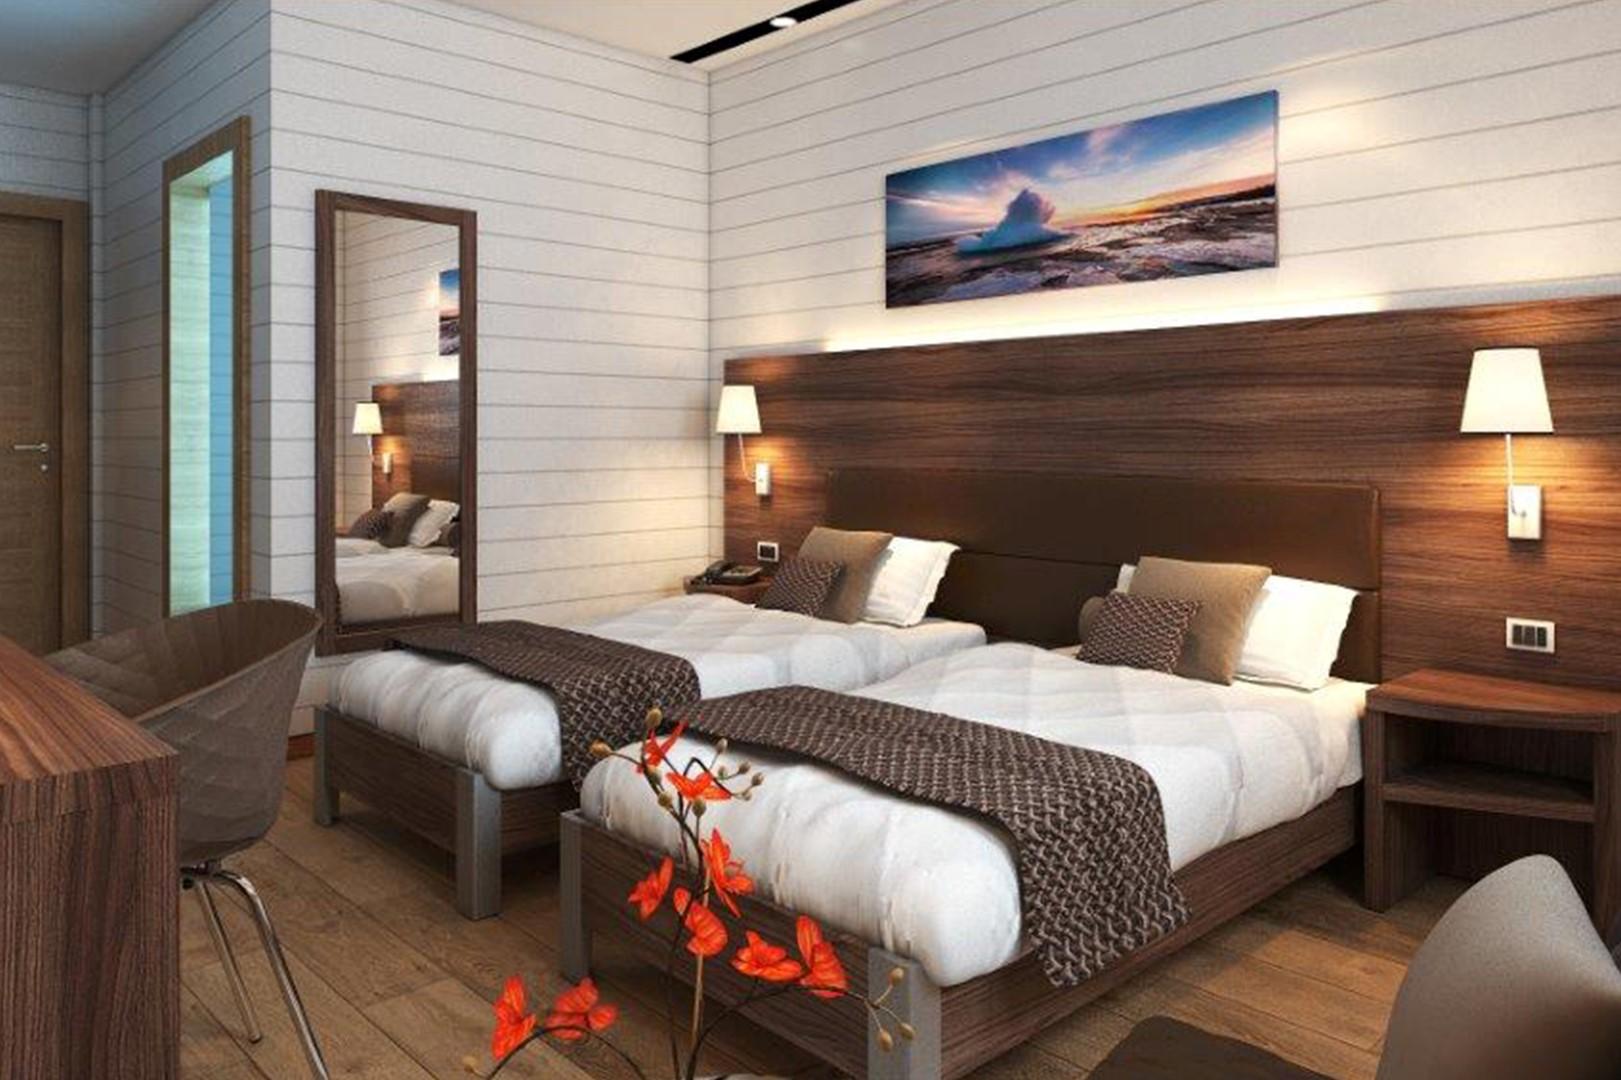 furniture_0004_2.twin room_hotel furniture (5)